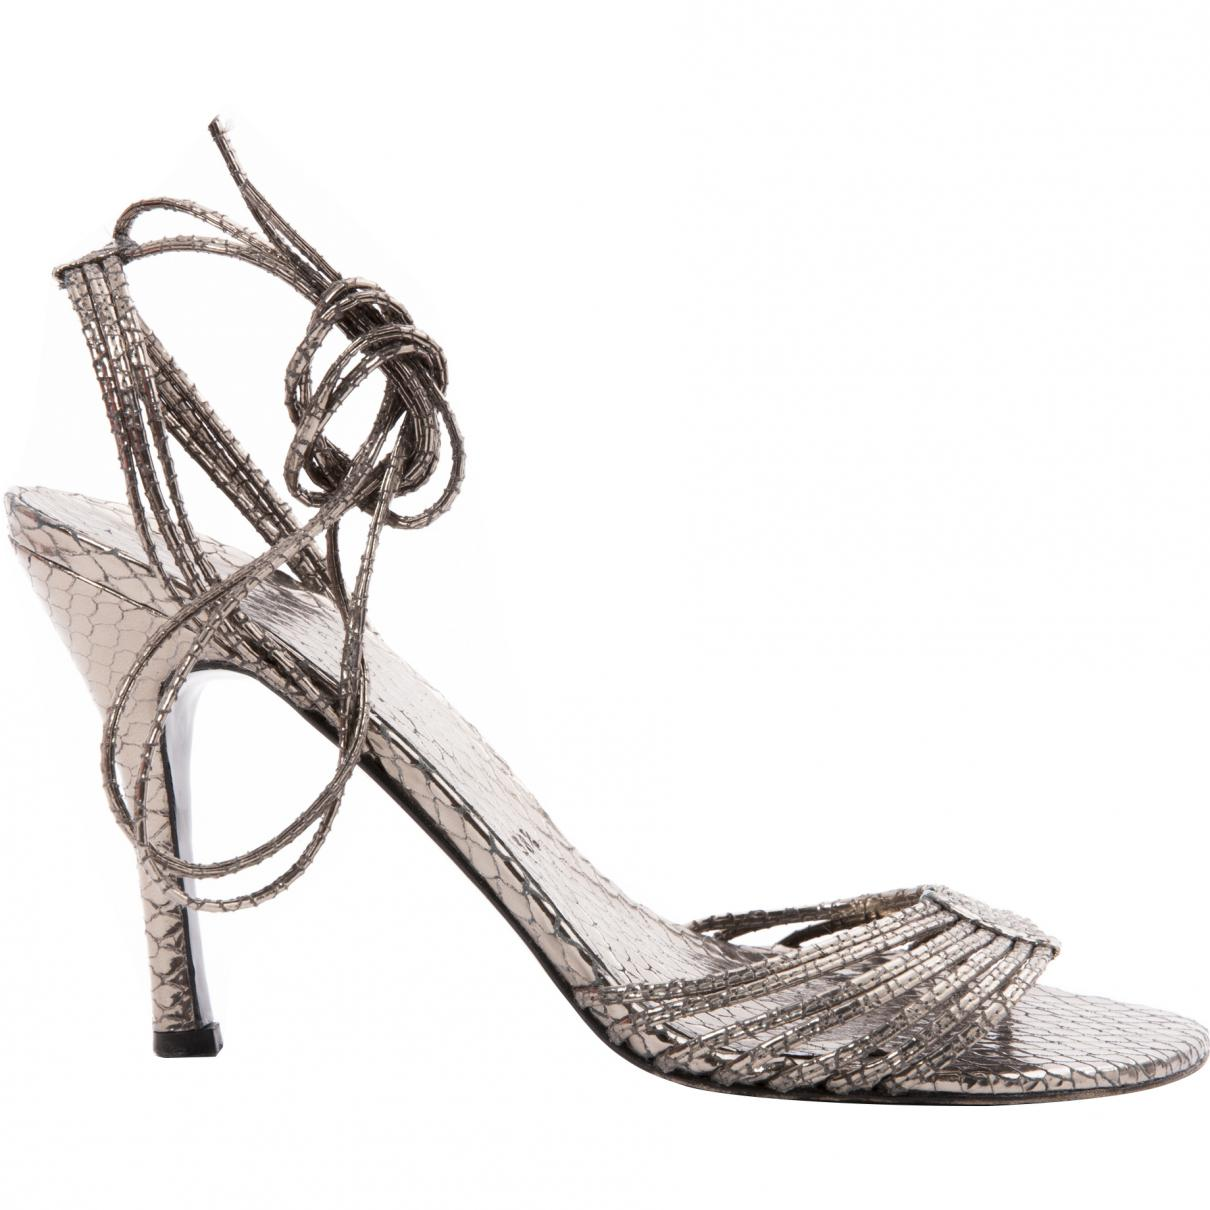 Pre-owned - Leather sandal Stuart Weitzman QP7wH2Hr